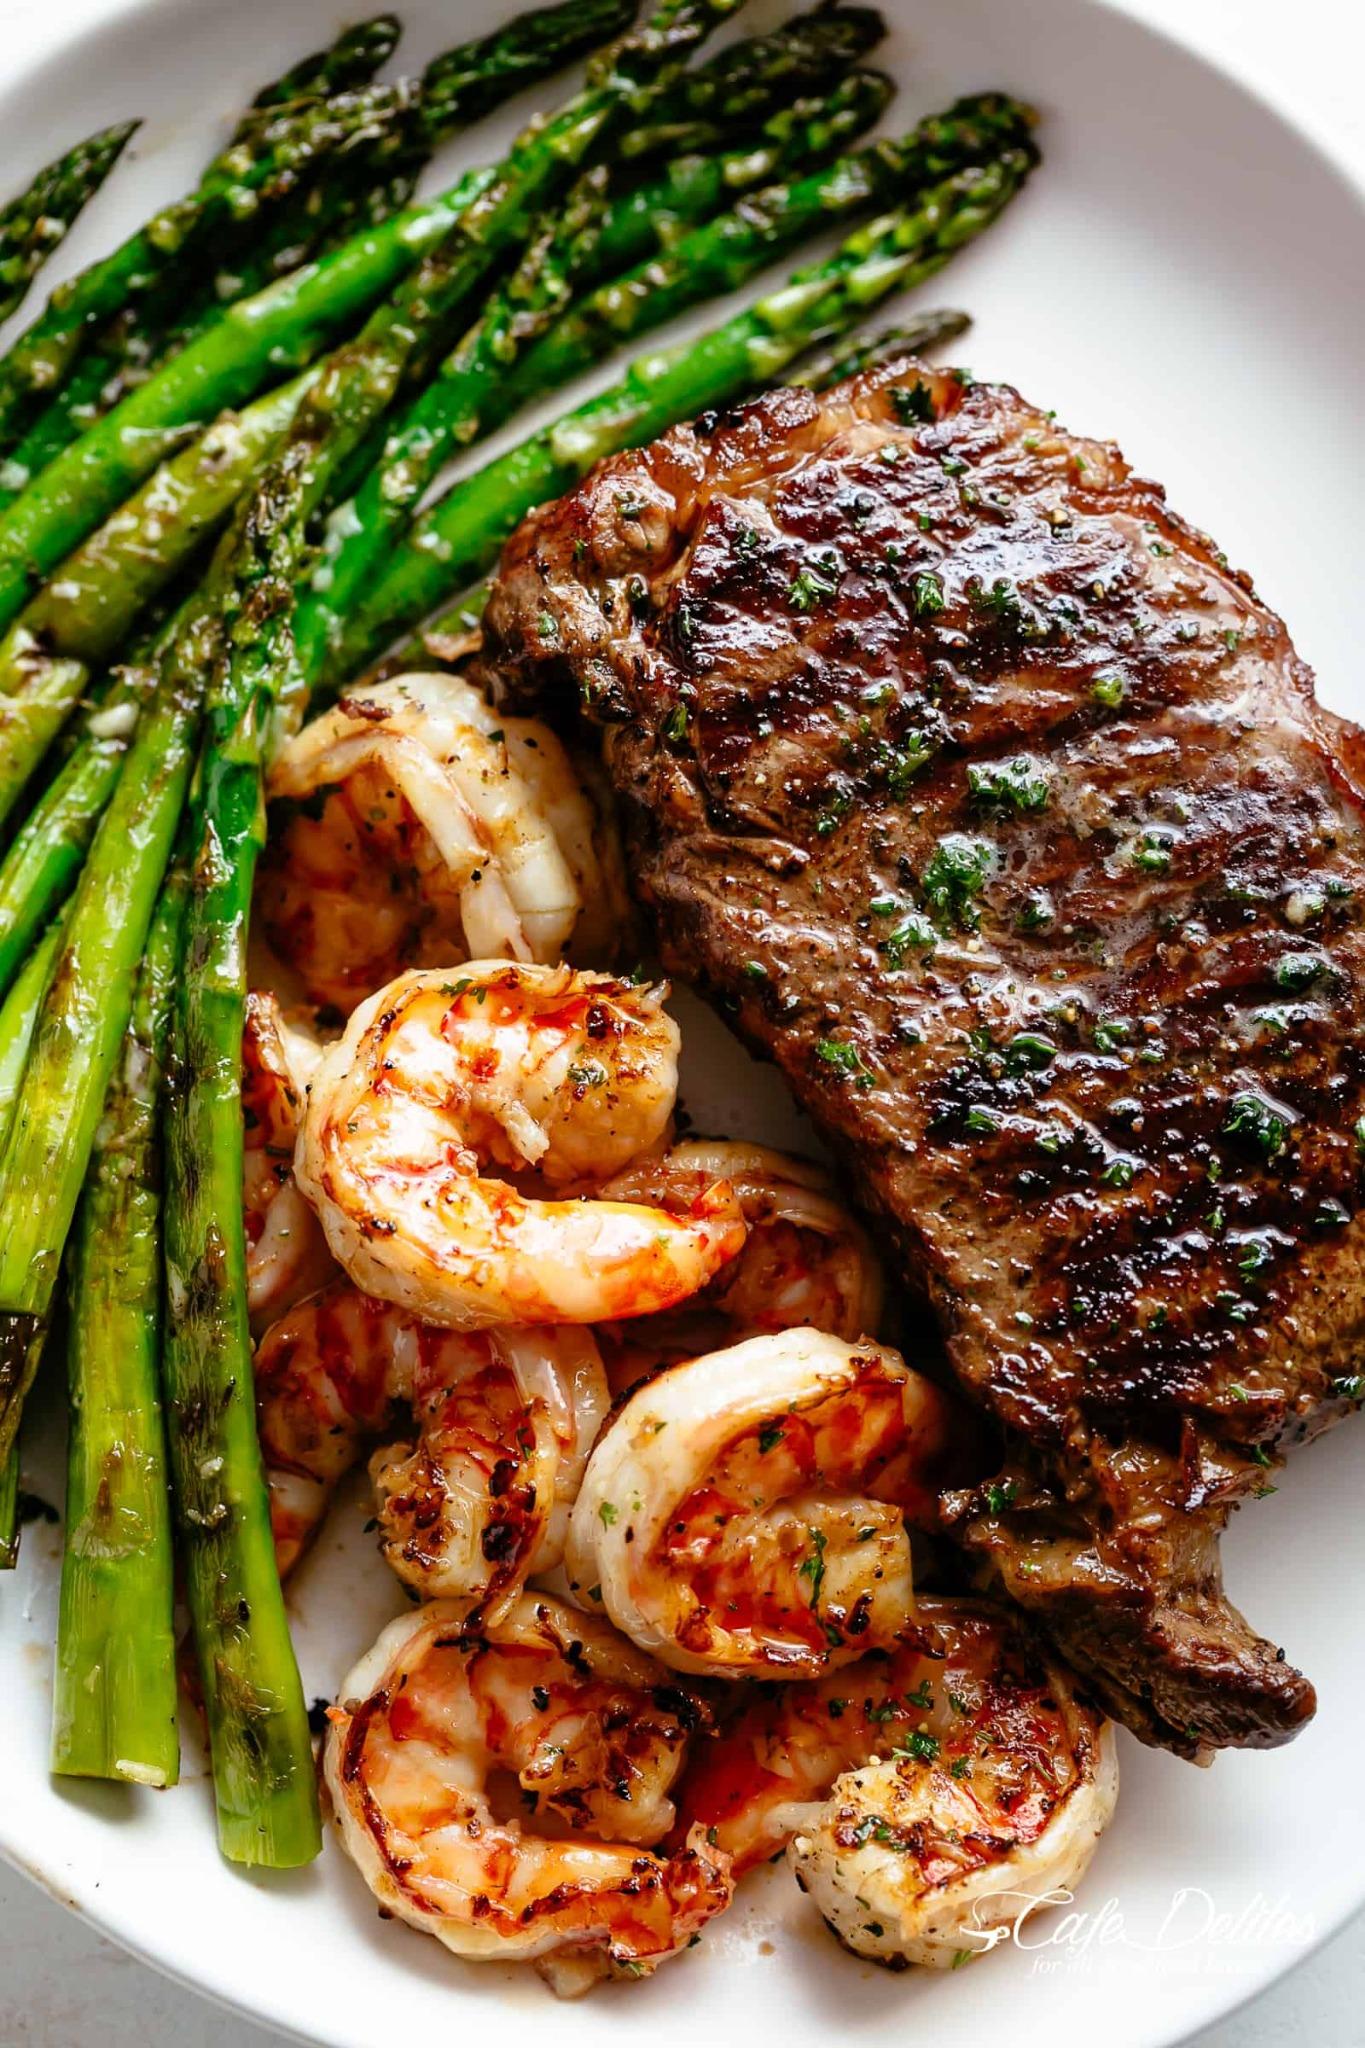 Garlic-Herb-Butter-Steak-With-Shrimp.png